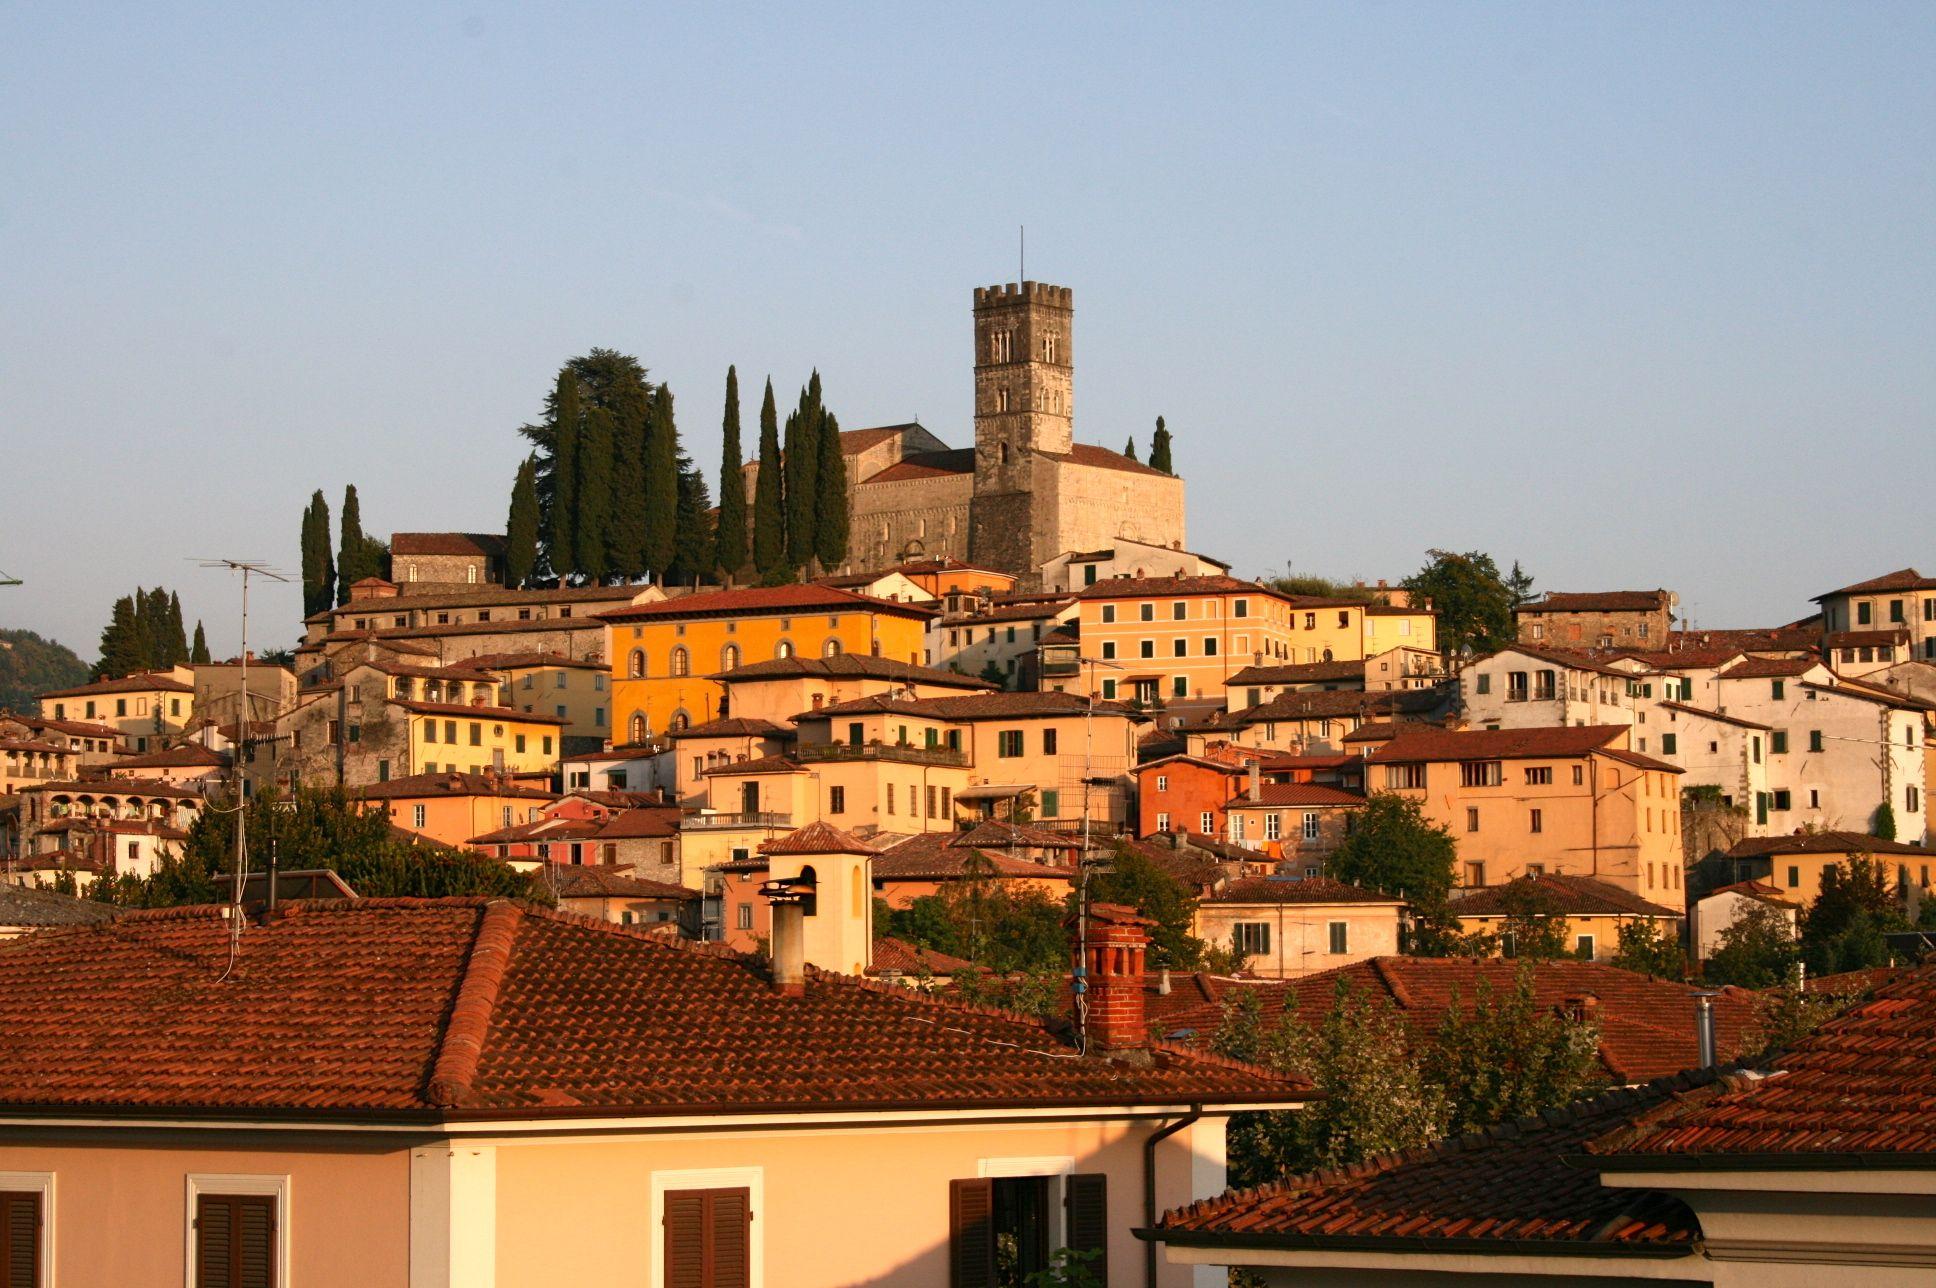 Barga Italy  City pictures : Barga, Italy | Barga, Italy | Pinterest